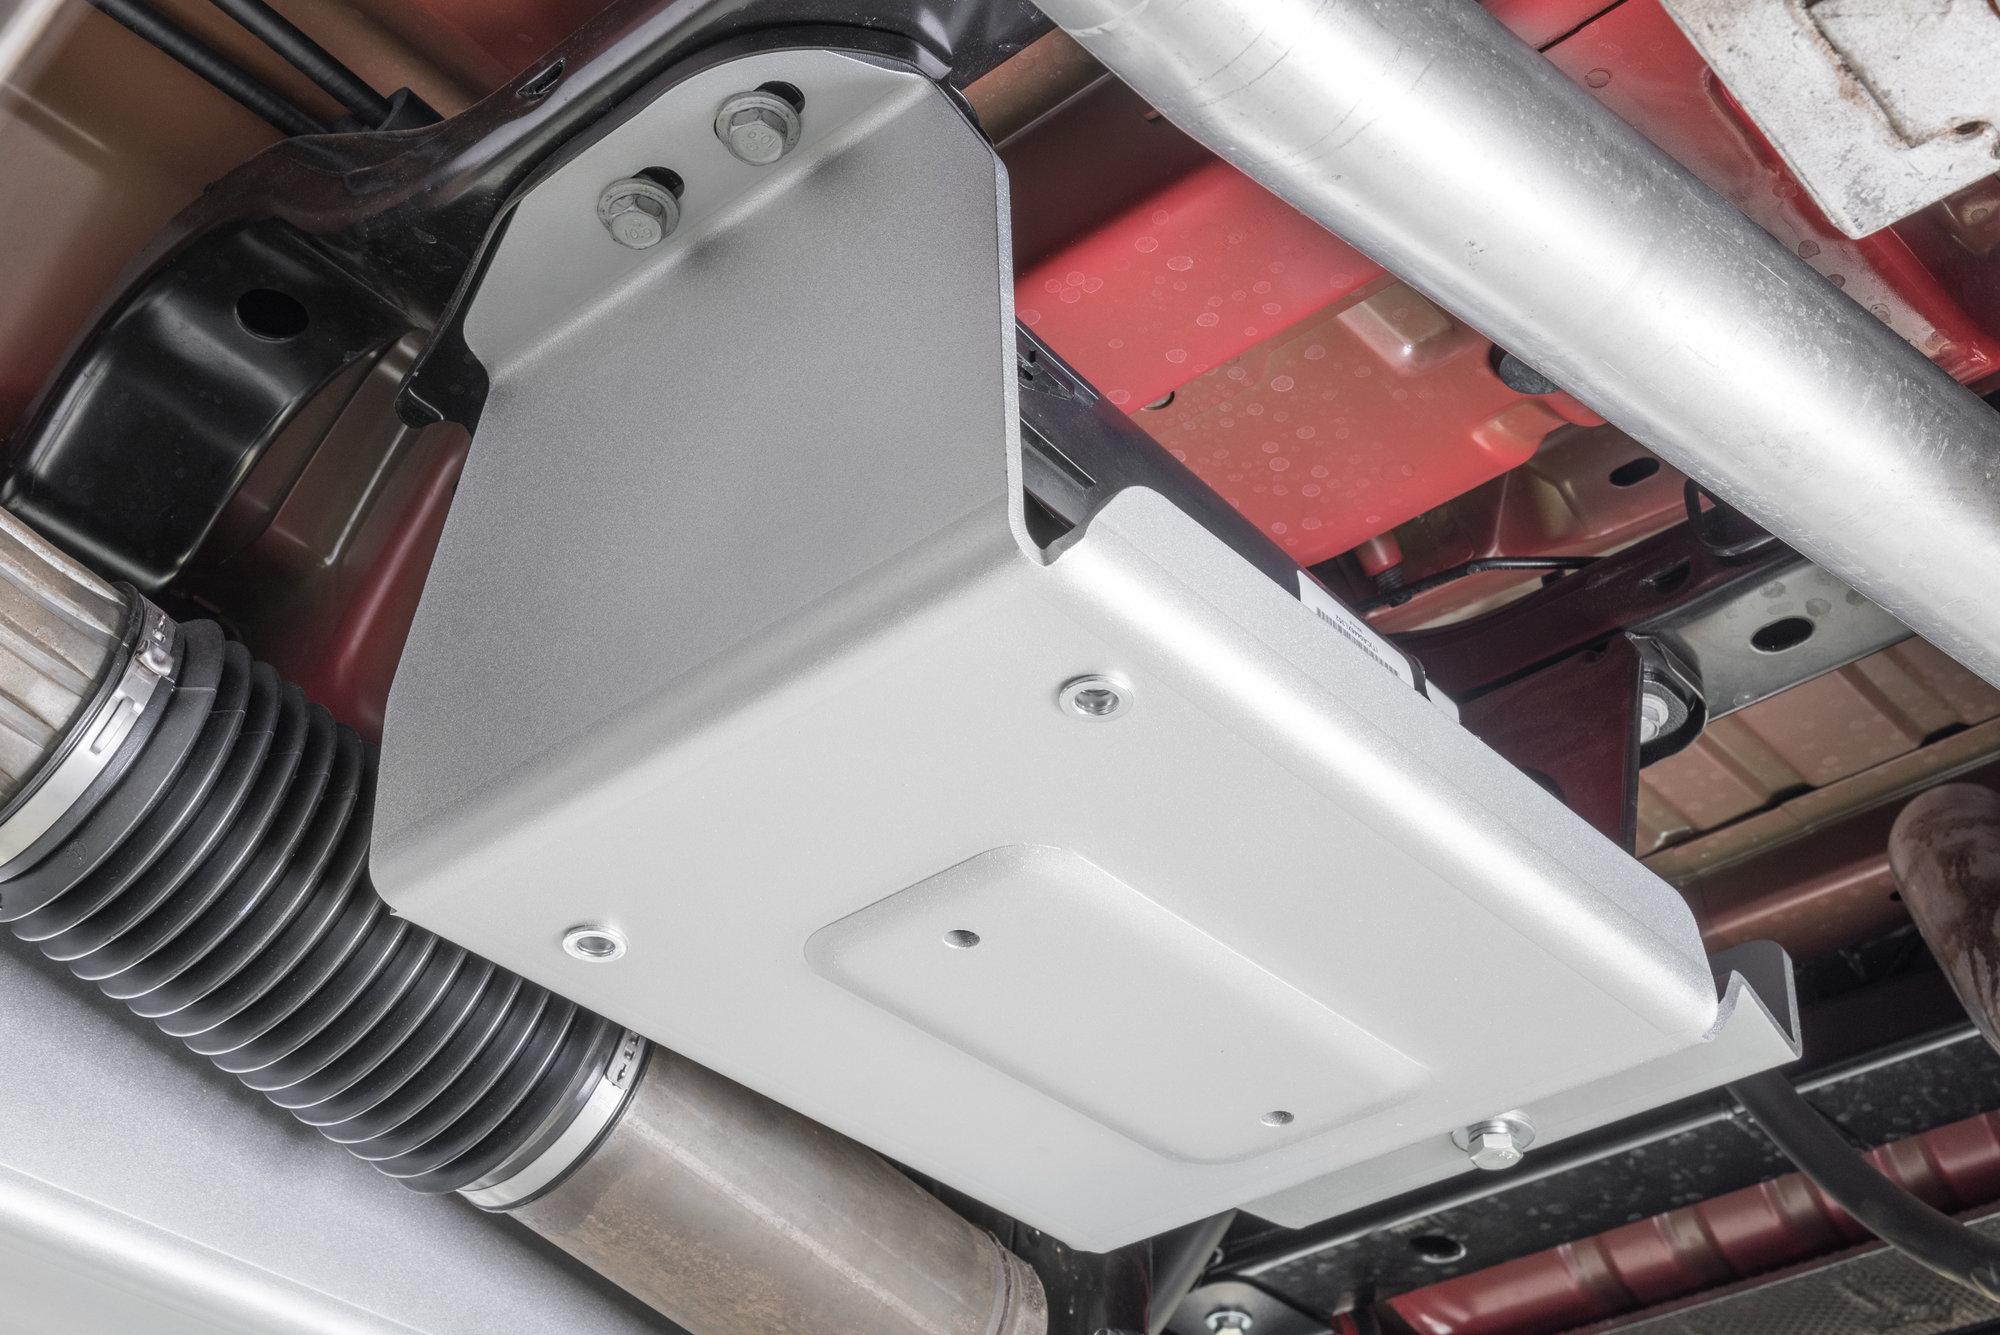 hight resolution of quadratec 12500 0210 aluminum modular evap canister skid plate for 07 18 jeep wrangler jk quadratec